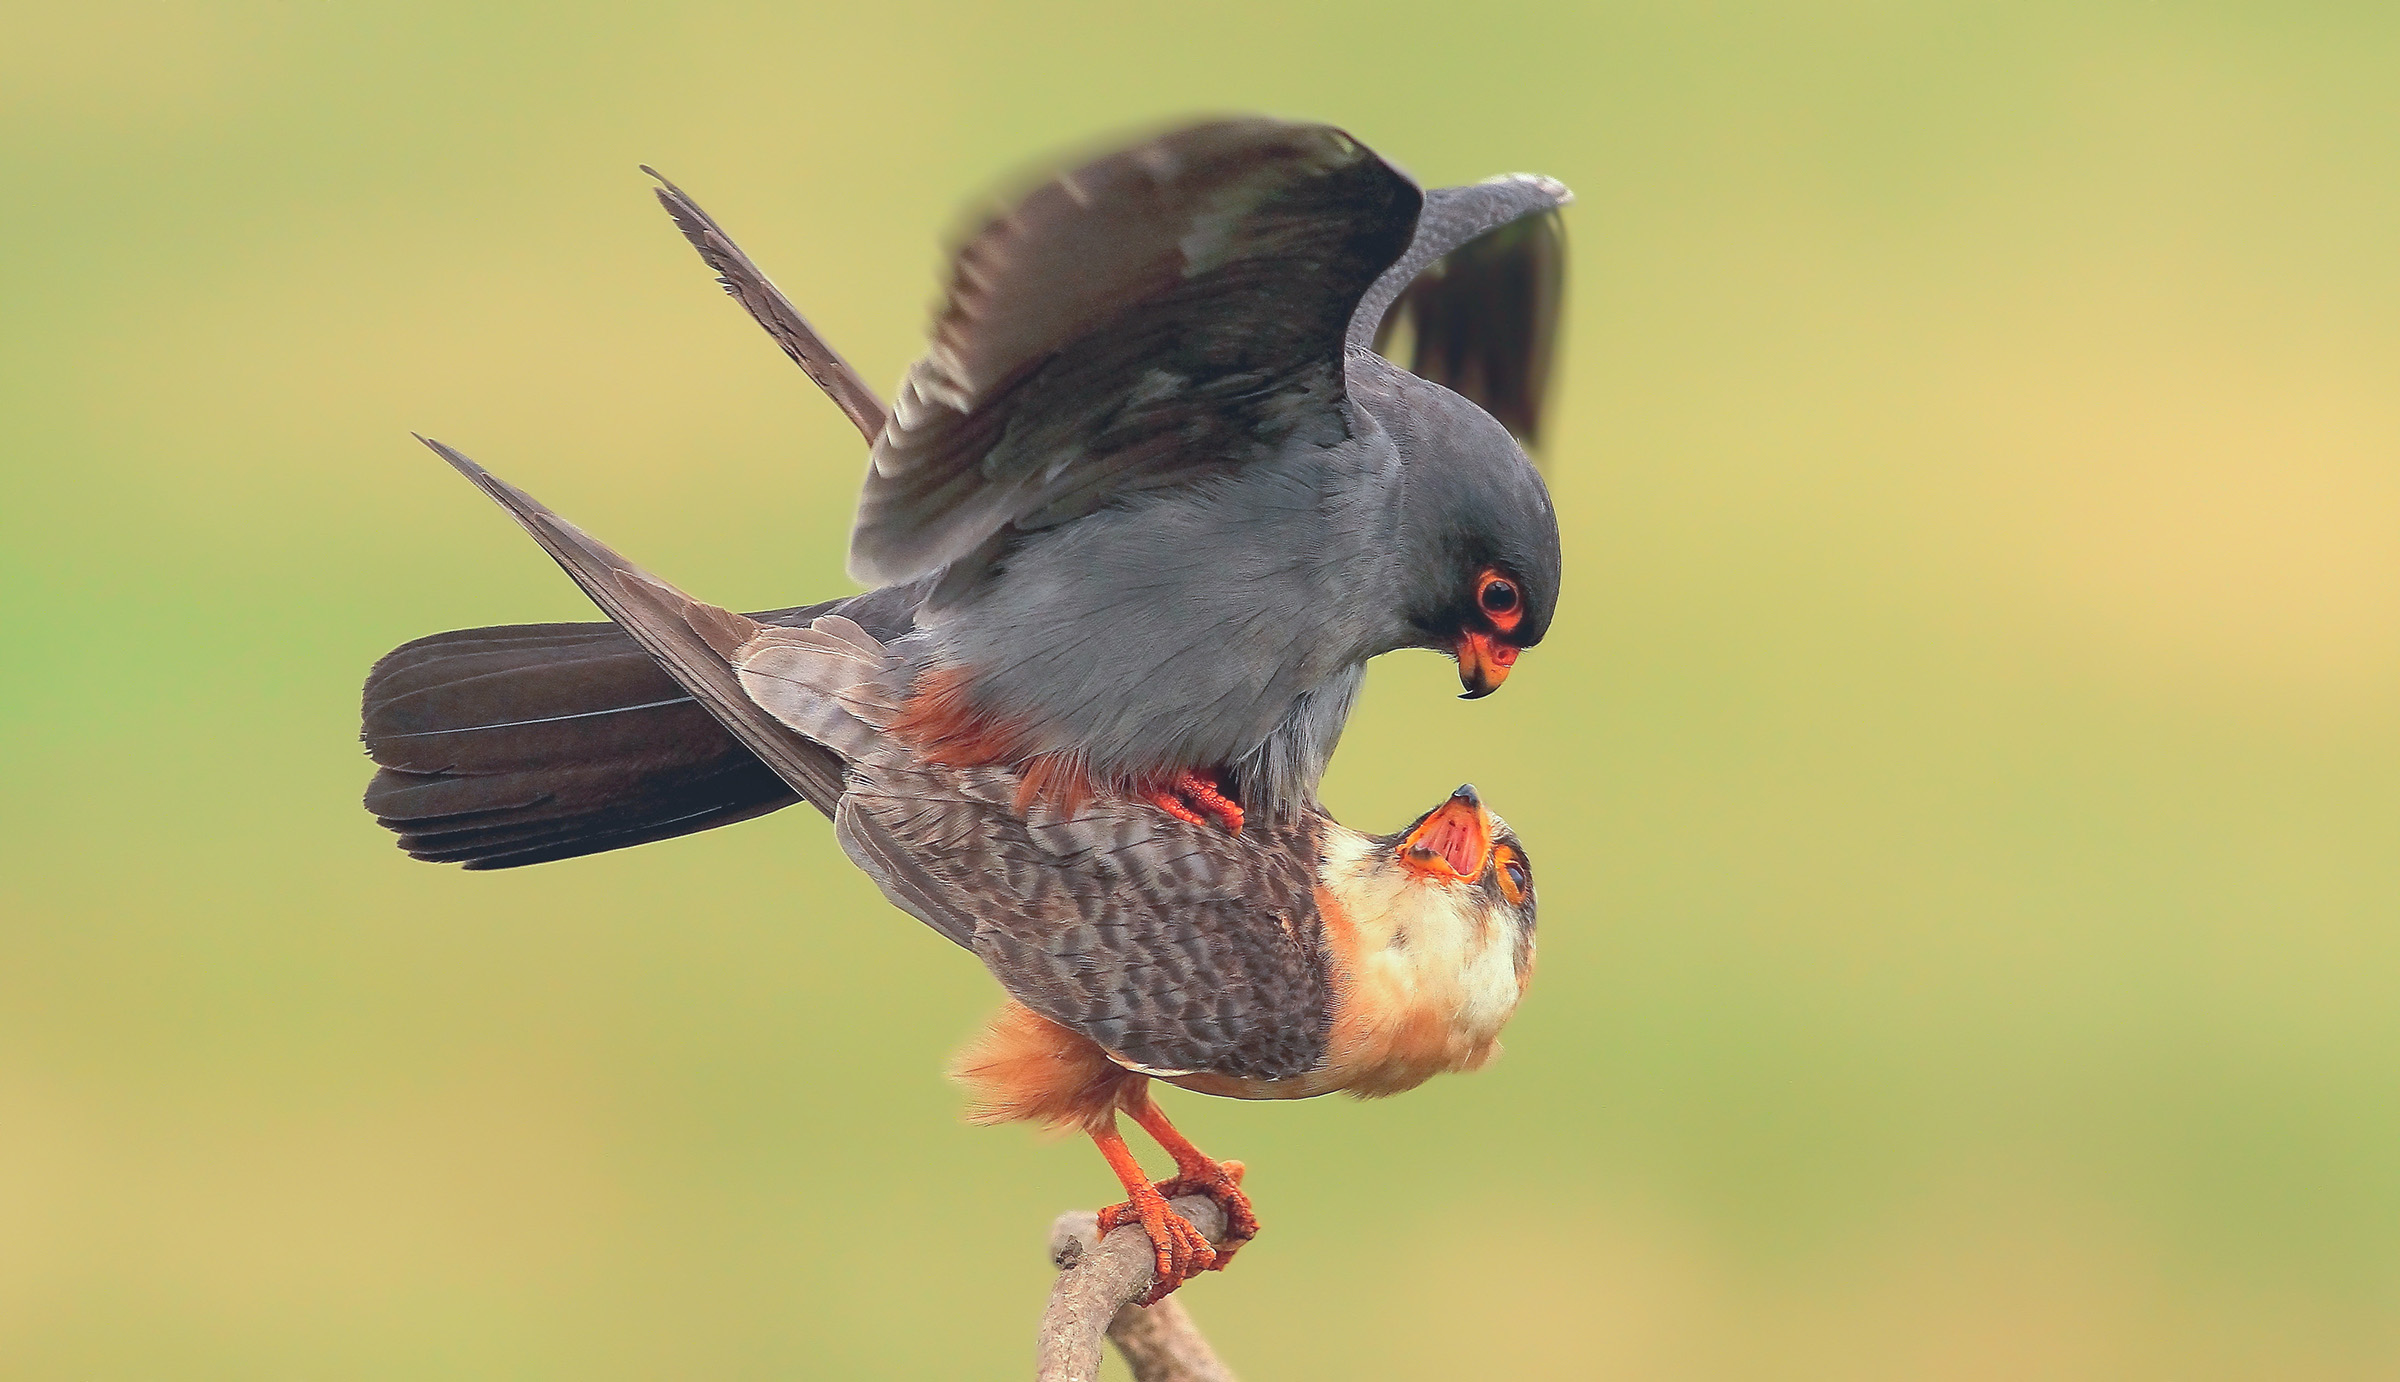 Cuckoo mating paw...